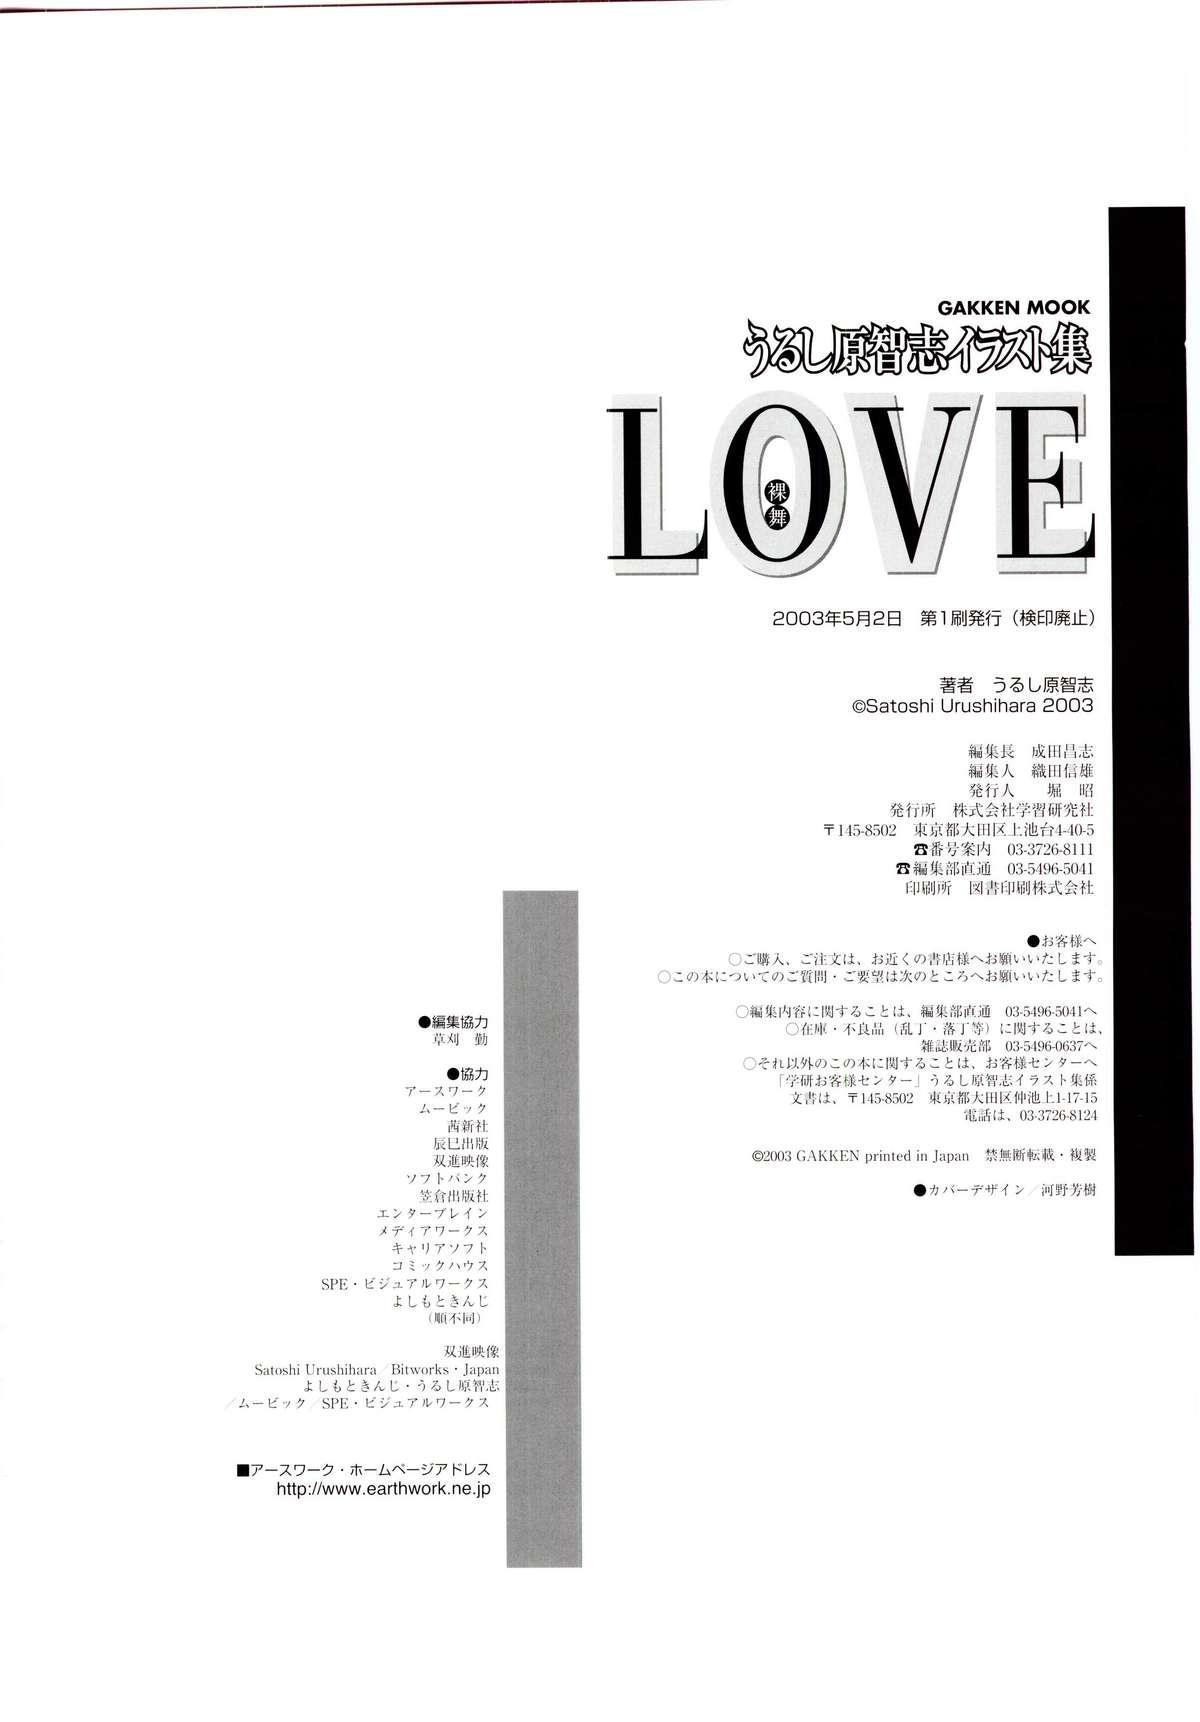 LOVE 84